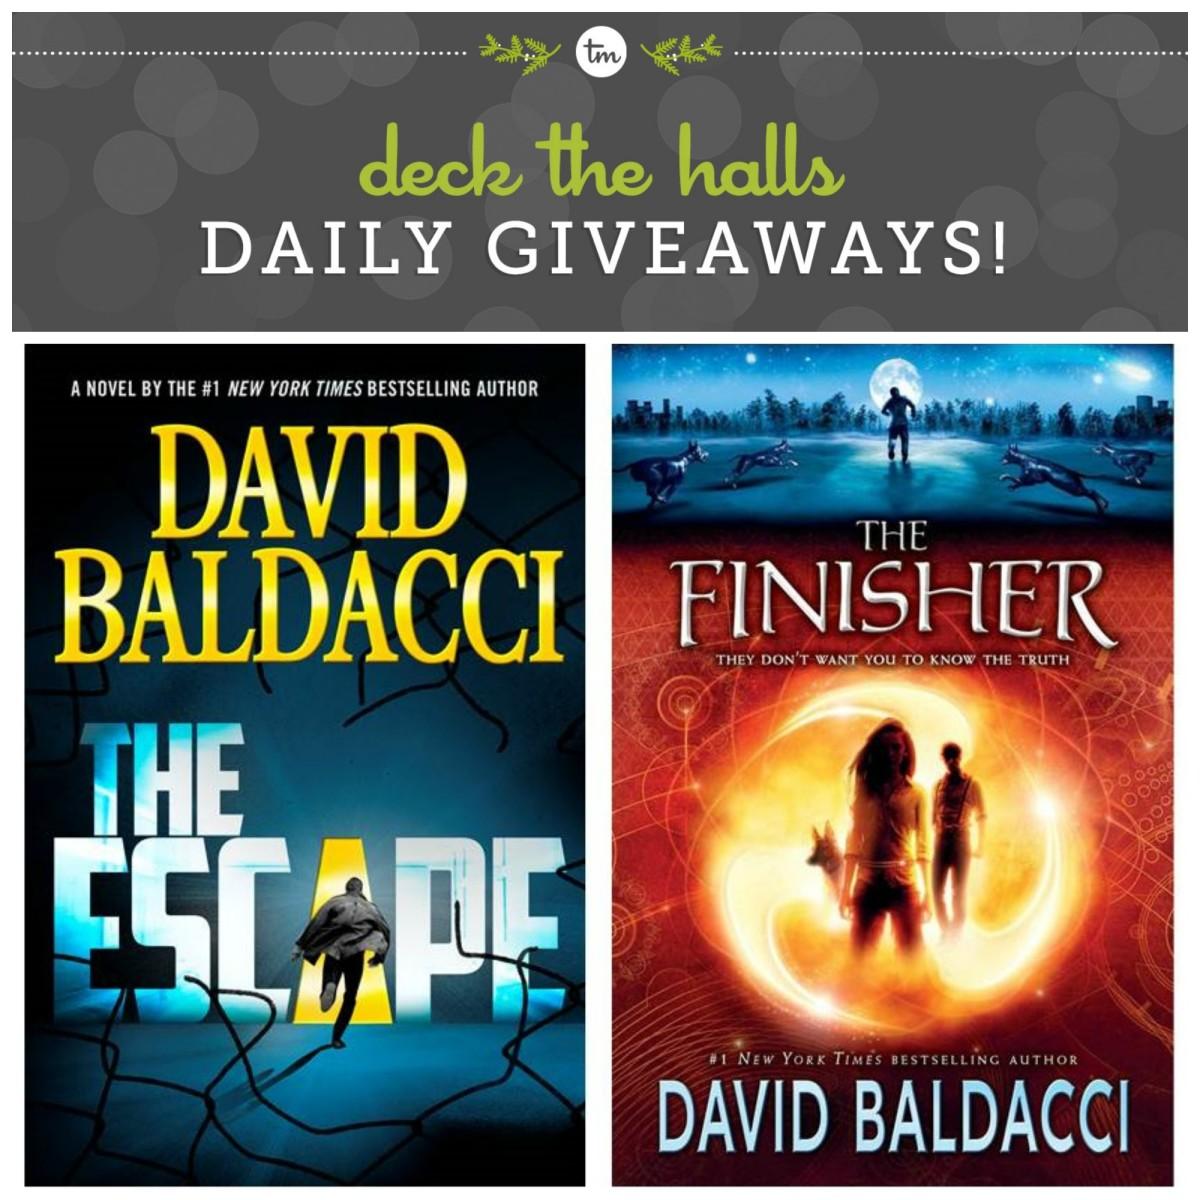 Deck the Halls with David Baldacci